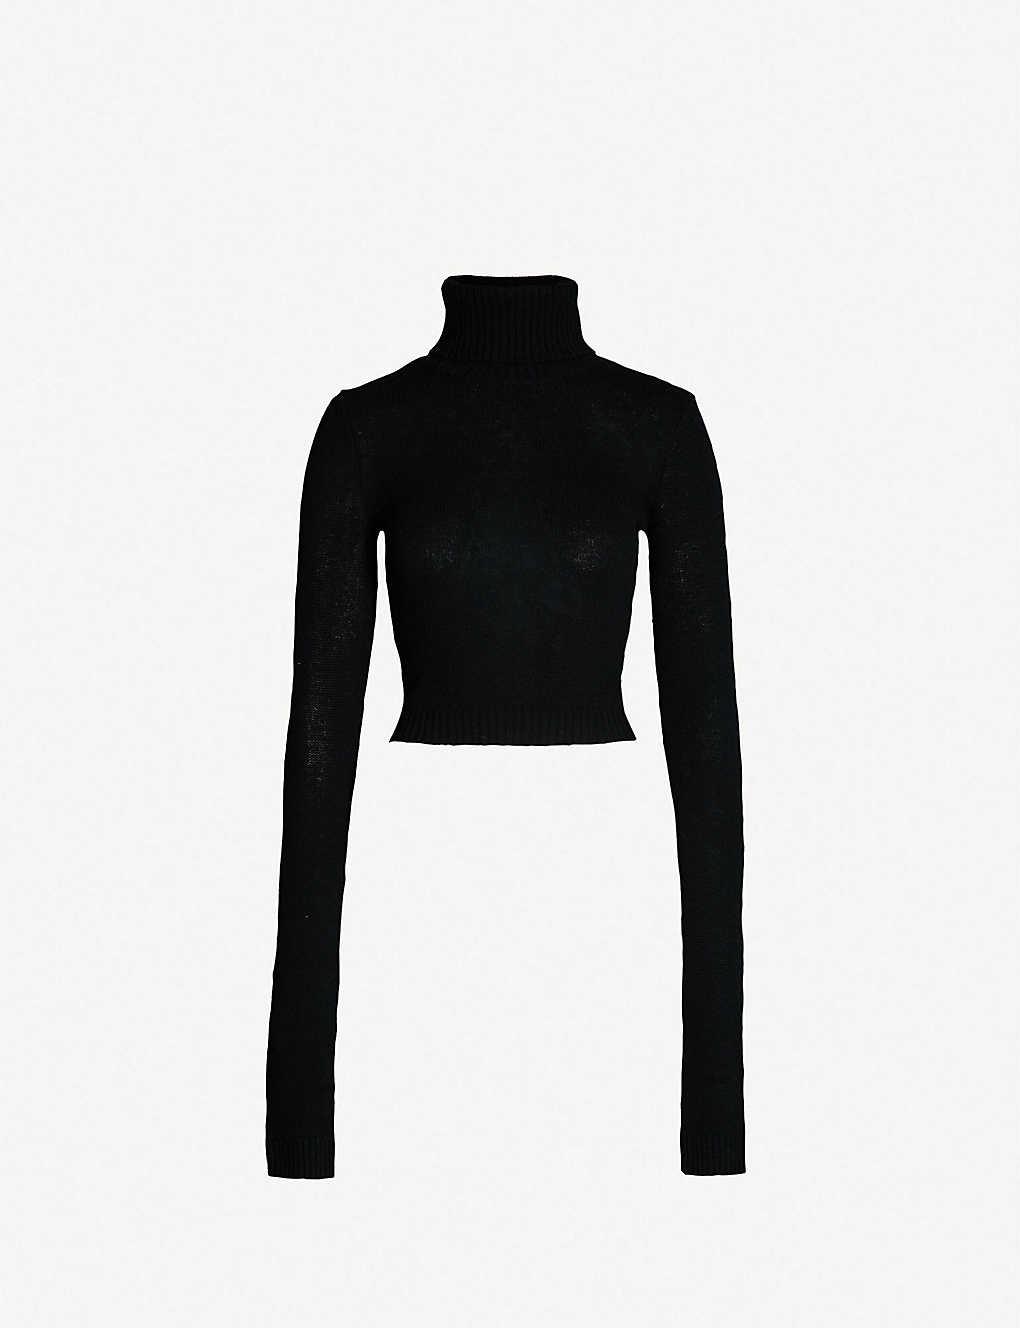 521ceb987feb6c THE KOOPLES - Roll-neck cropped wool-cashmere jumper | Selfridges.com